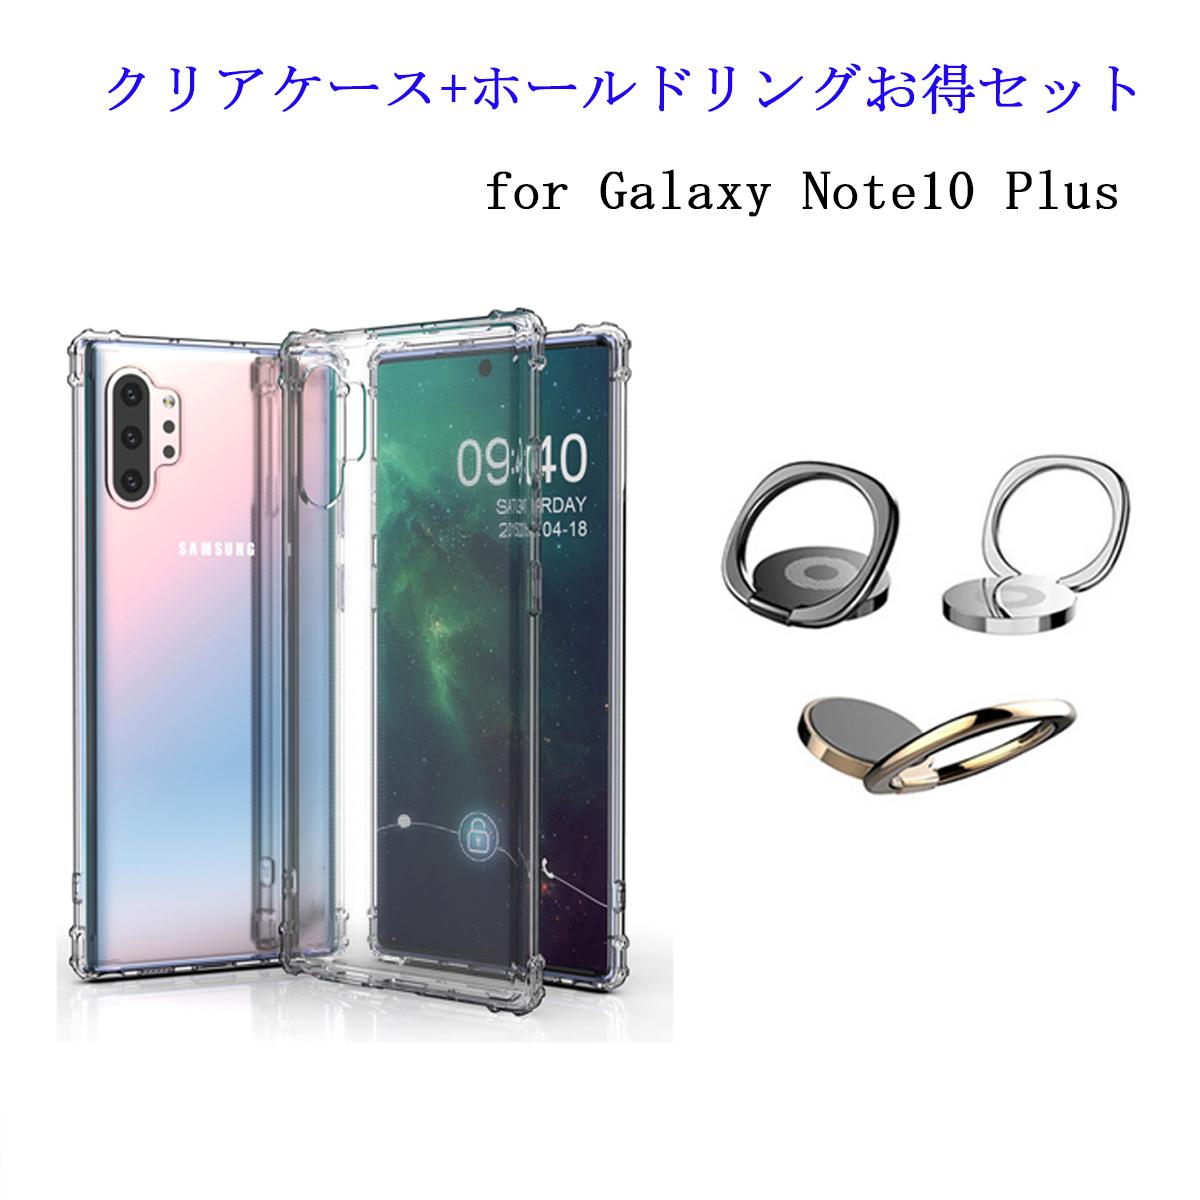 Galaxy Note10 Plus ケース ホールドリング セット SC-01M 内祝い SCV45 クリアスマホケース カバー ギャラクシー 予約販売品 ノート10プラス 背面マイクロドット加工 ストラップ付 衝撃吸収 透明 ストラップホール クリアケース note10+